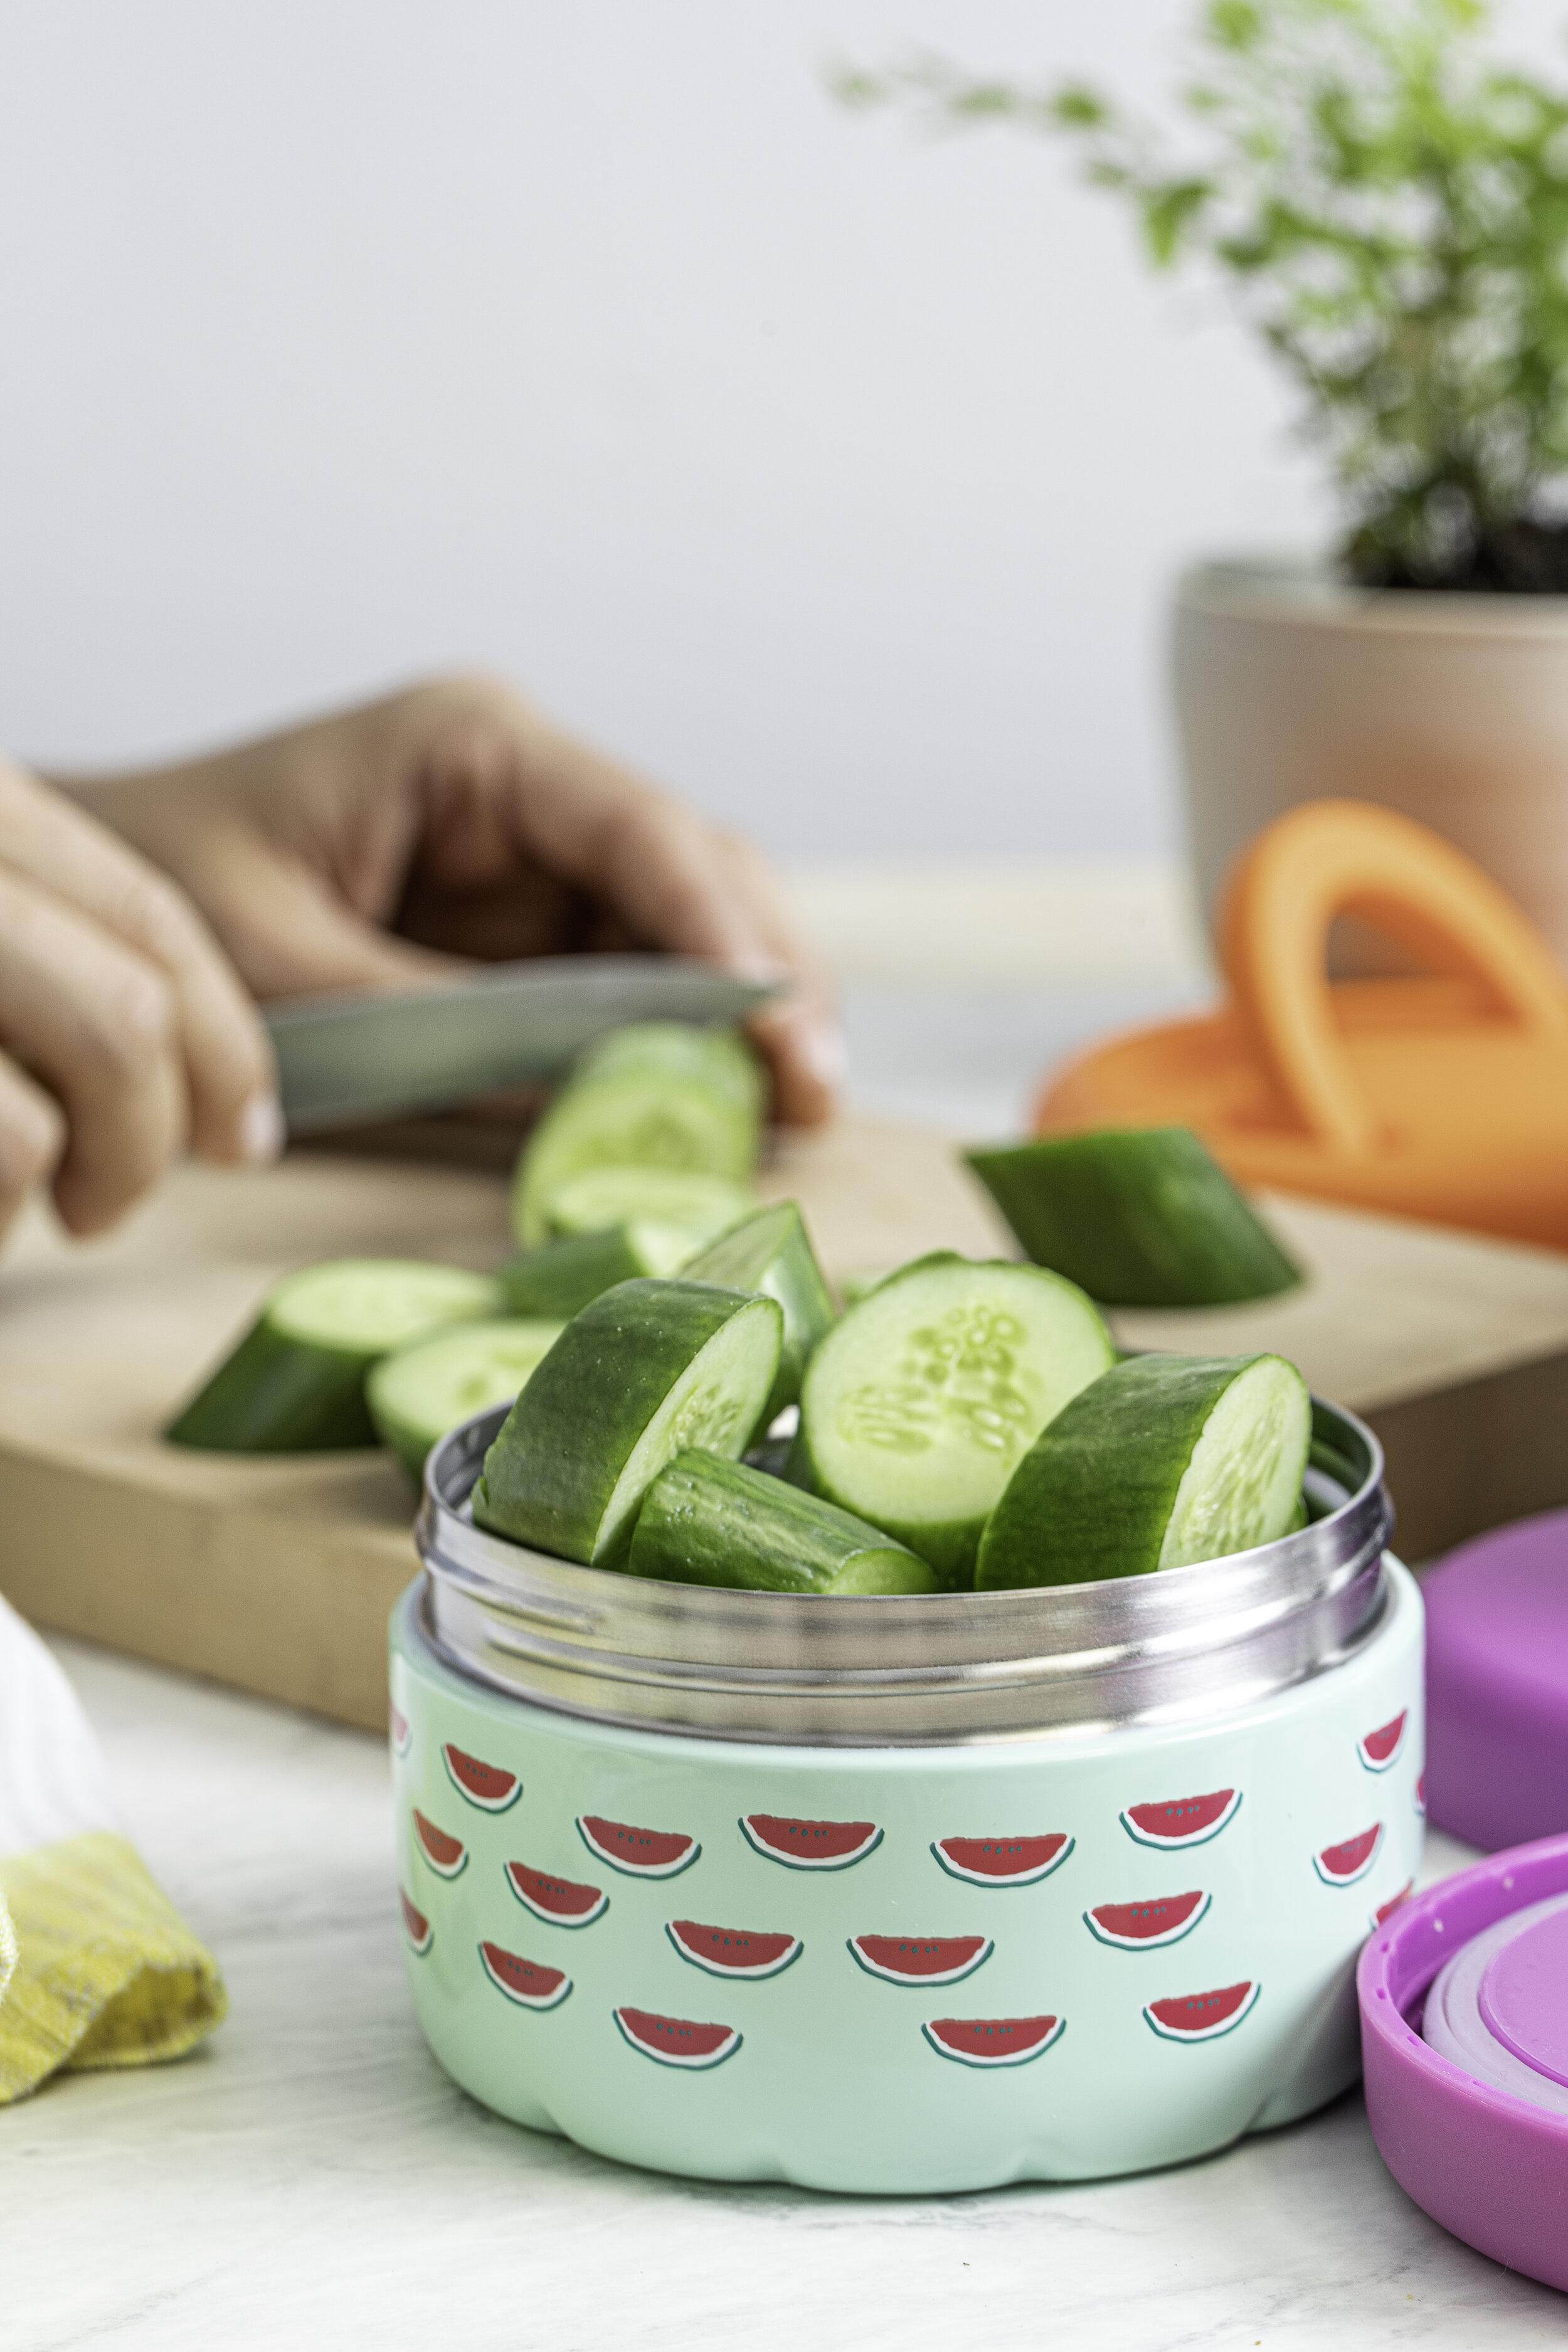 S'well Eats School Snacks, Cucumbers,  Photographer: Maria Midoes, Food Stylist: Judy Kim , Prop Stylist: Maya Rossi1